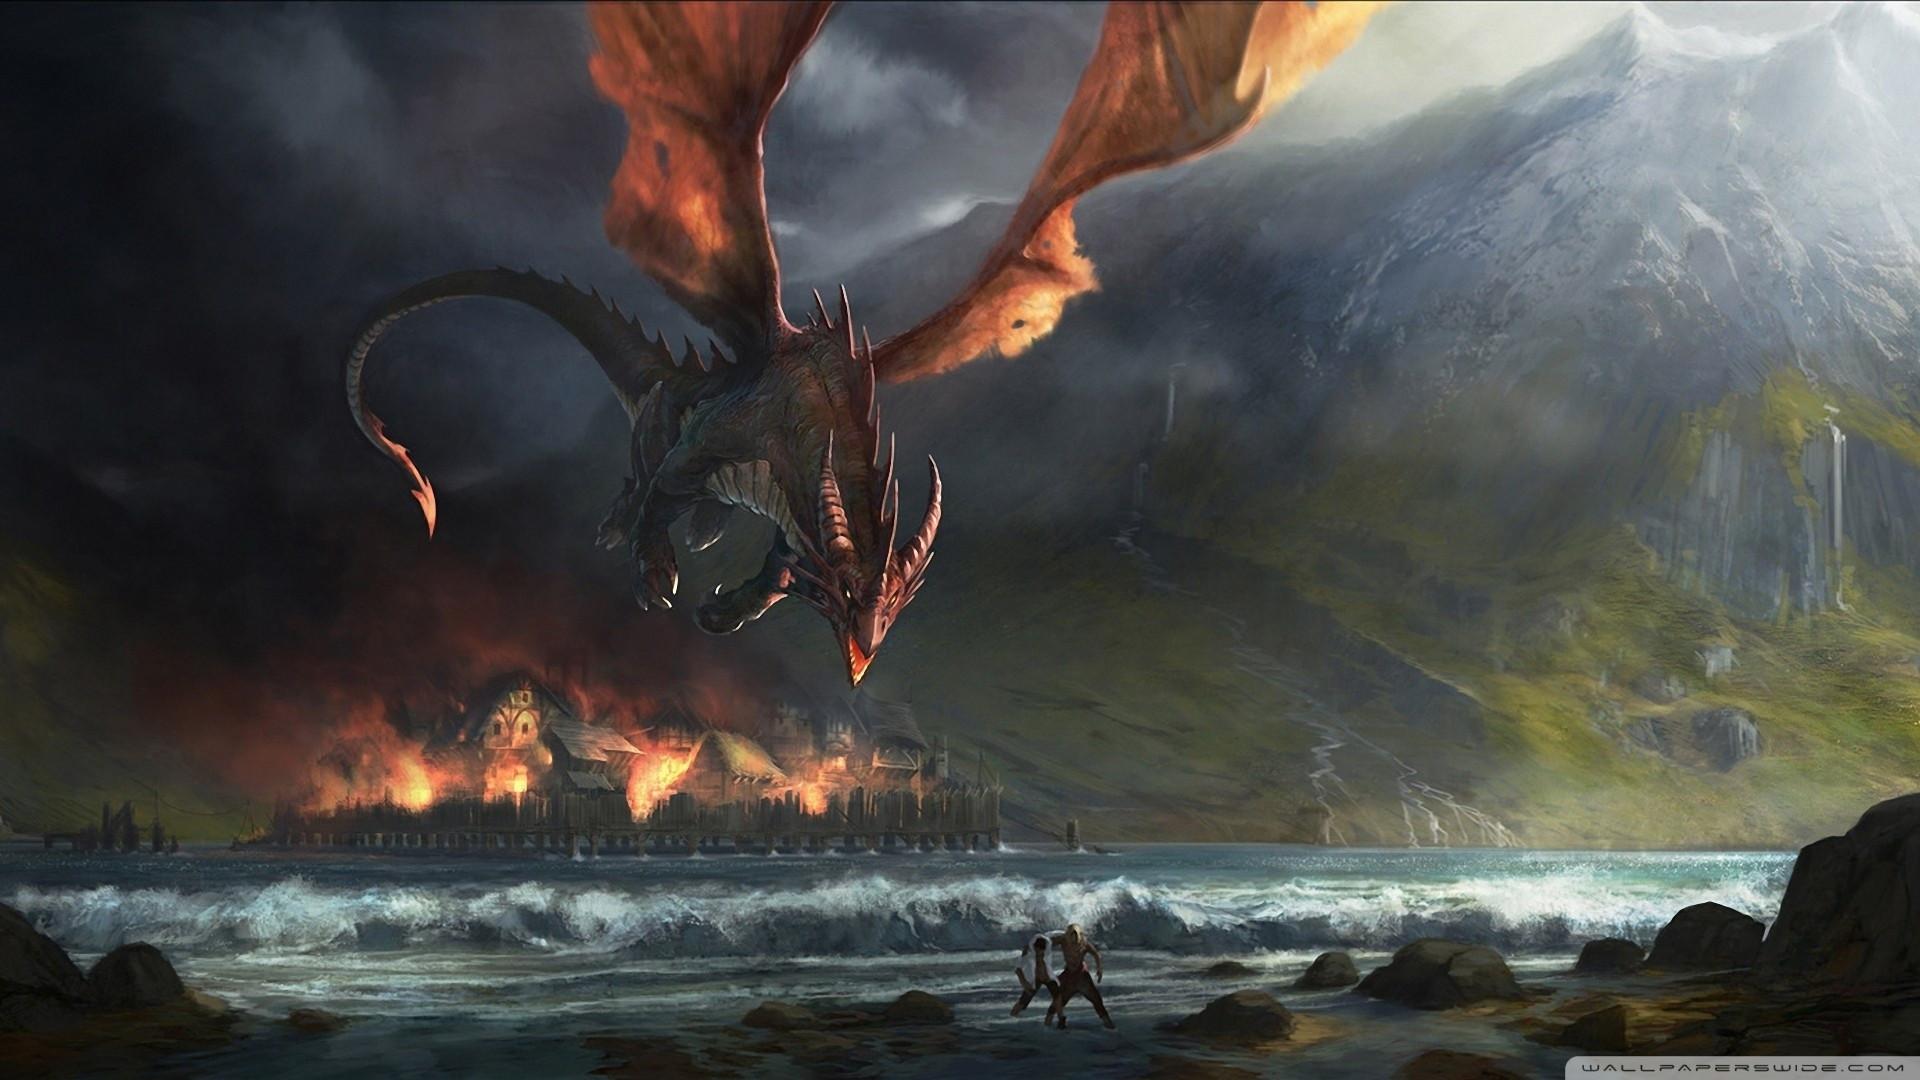 Mobile Wallpaper Inspirational Quotes Free Download Dragon Backgrounds Pixelstalk Net